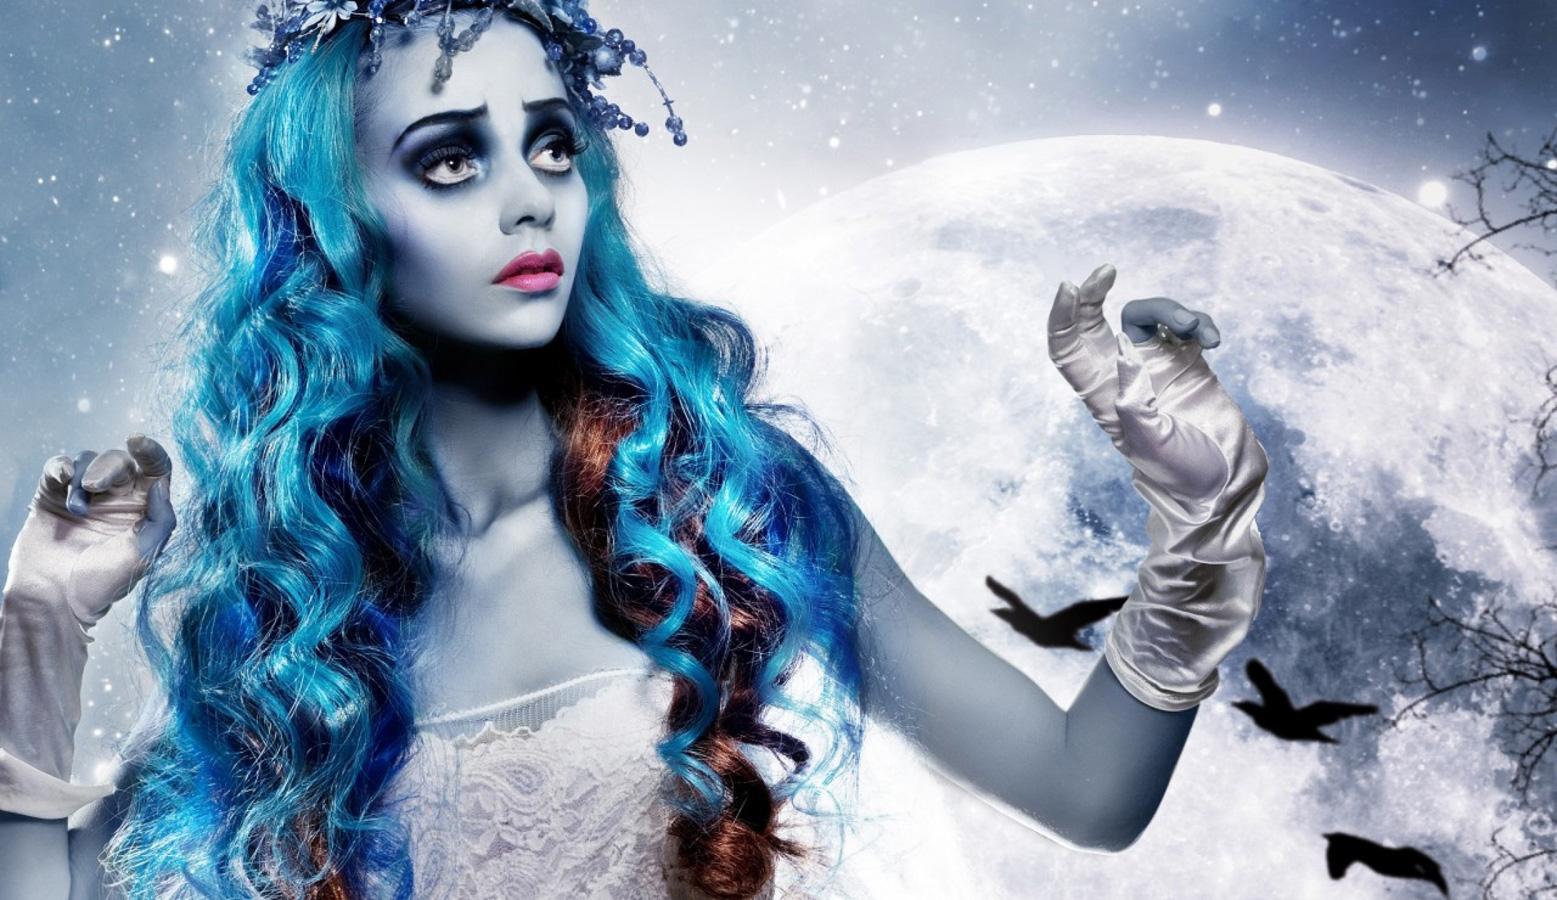 IMG_0523. Творческий проект «Мертвая невеста», фотограф Лена Волкова